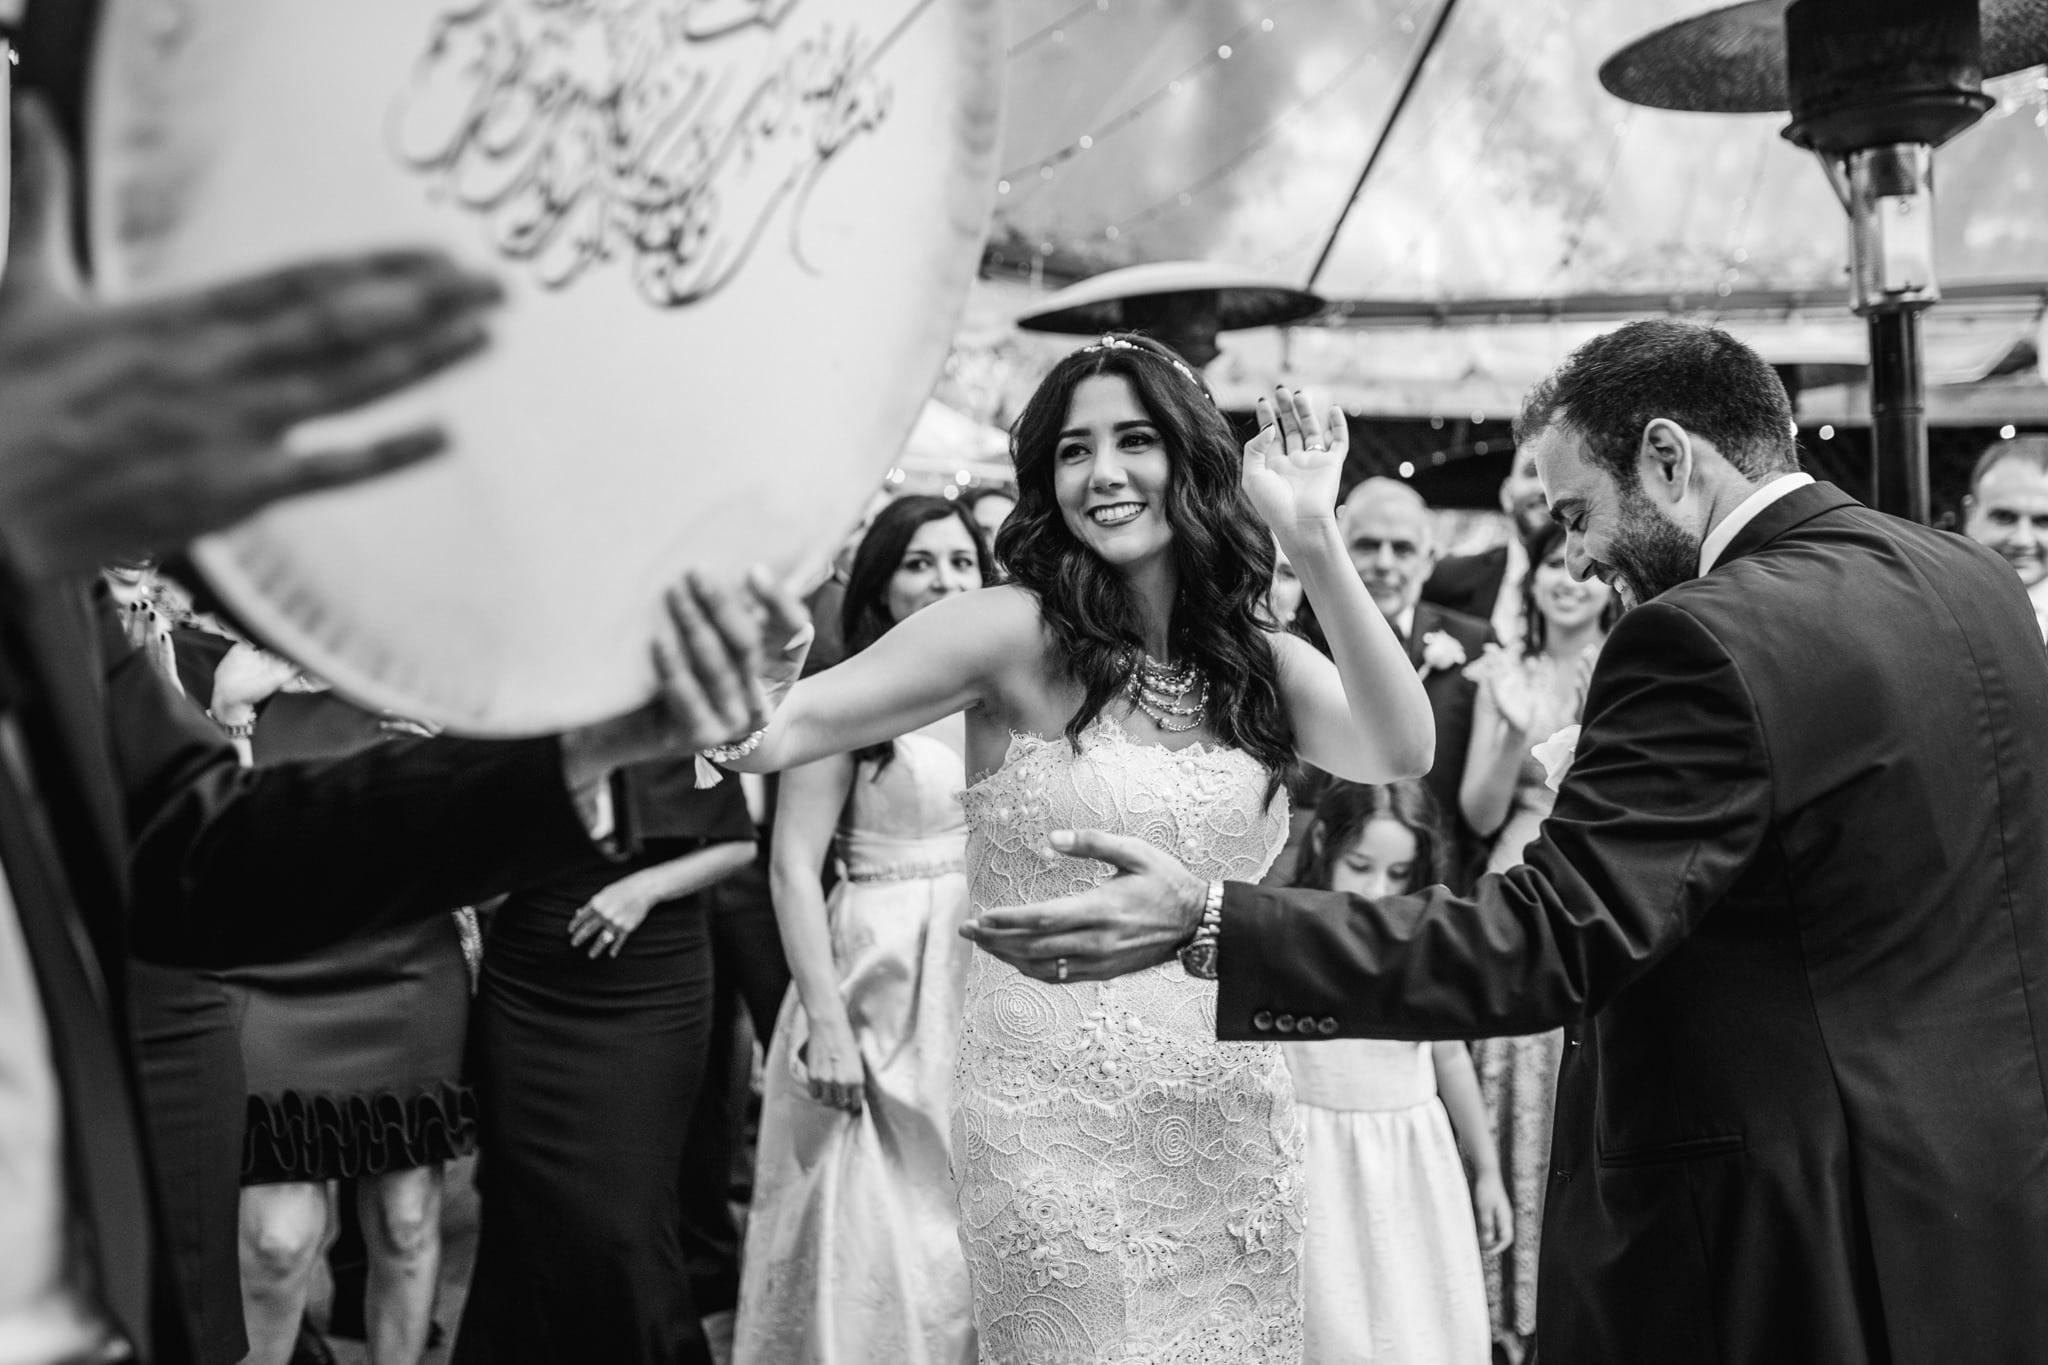 bride and groom party at venue